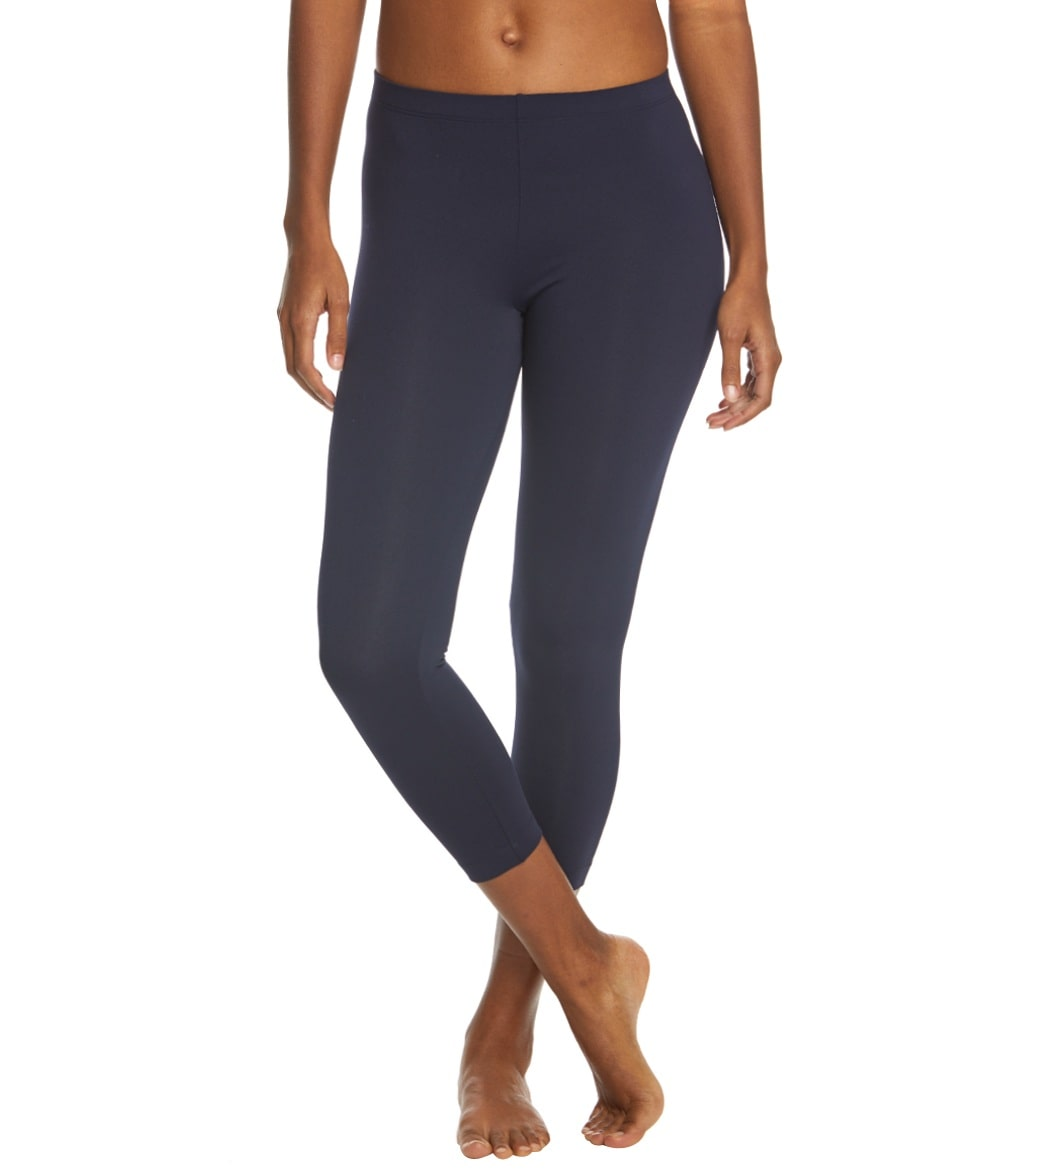 34e26465bbf2b Danskin Body Fit Yoga Capris at YogaOutlet.com